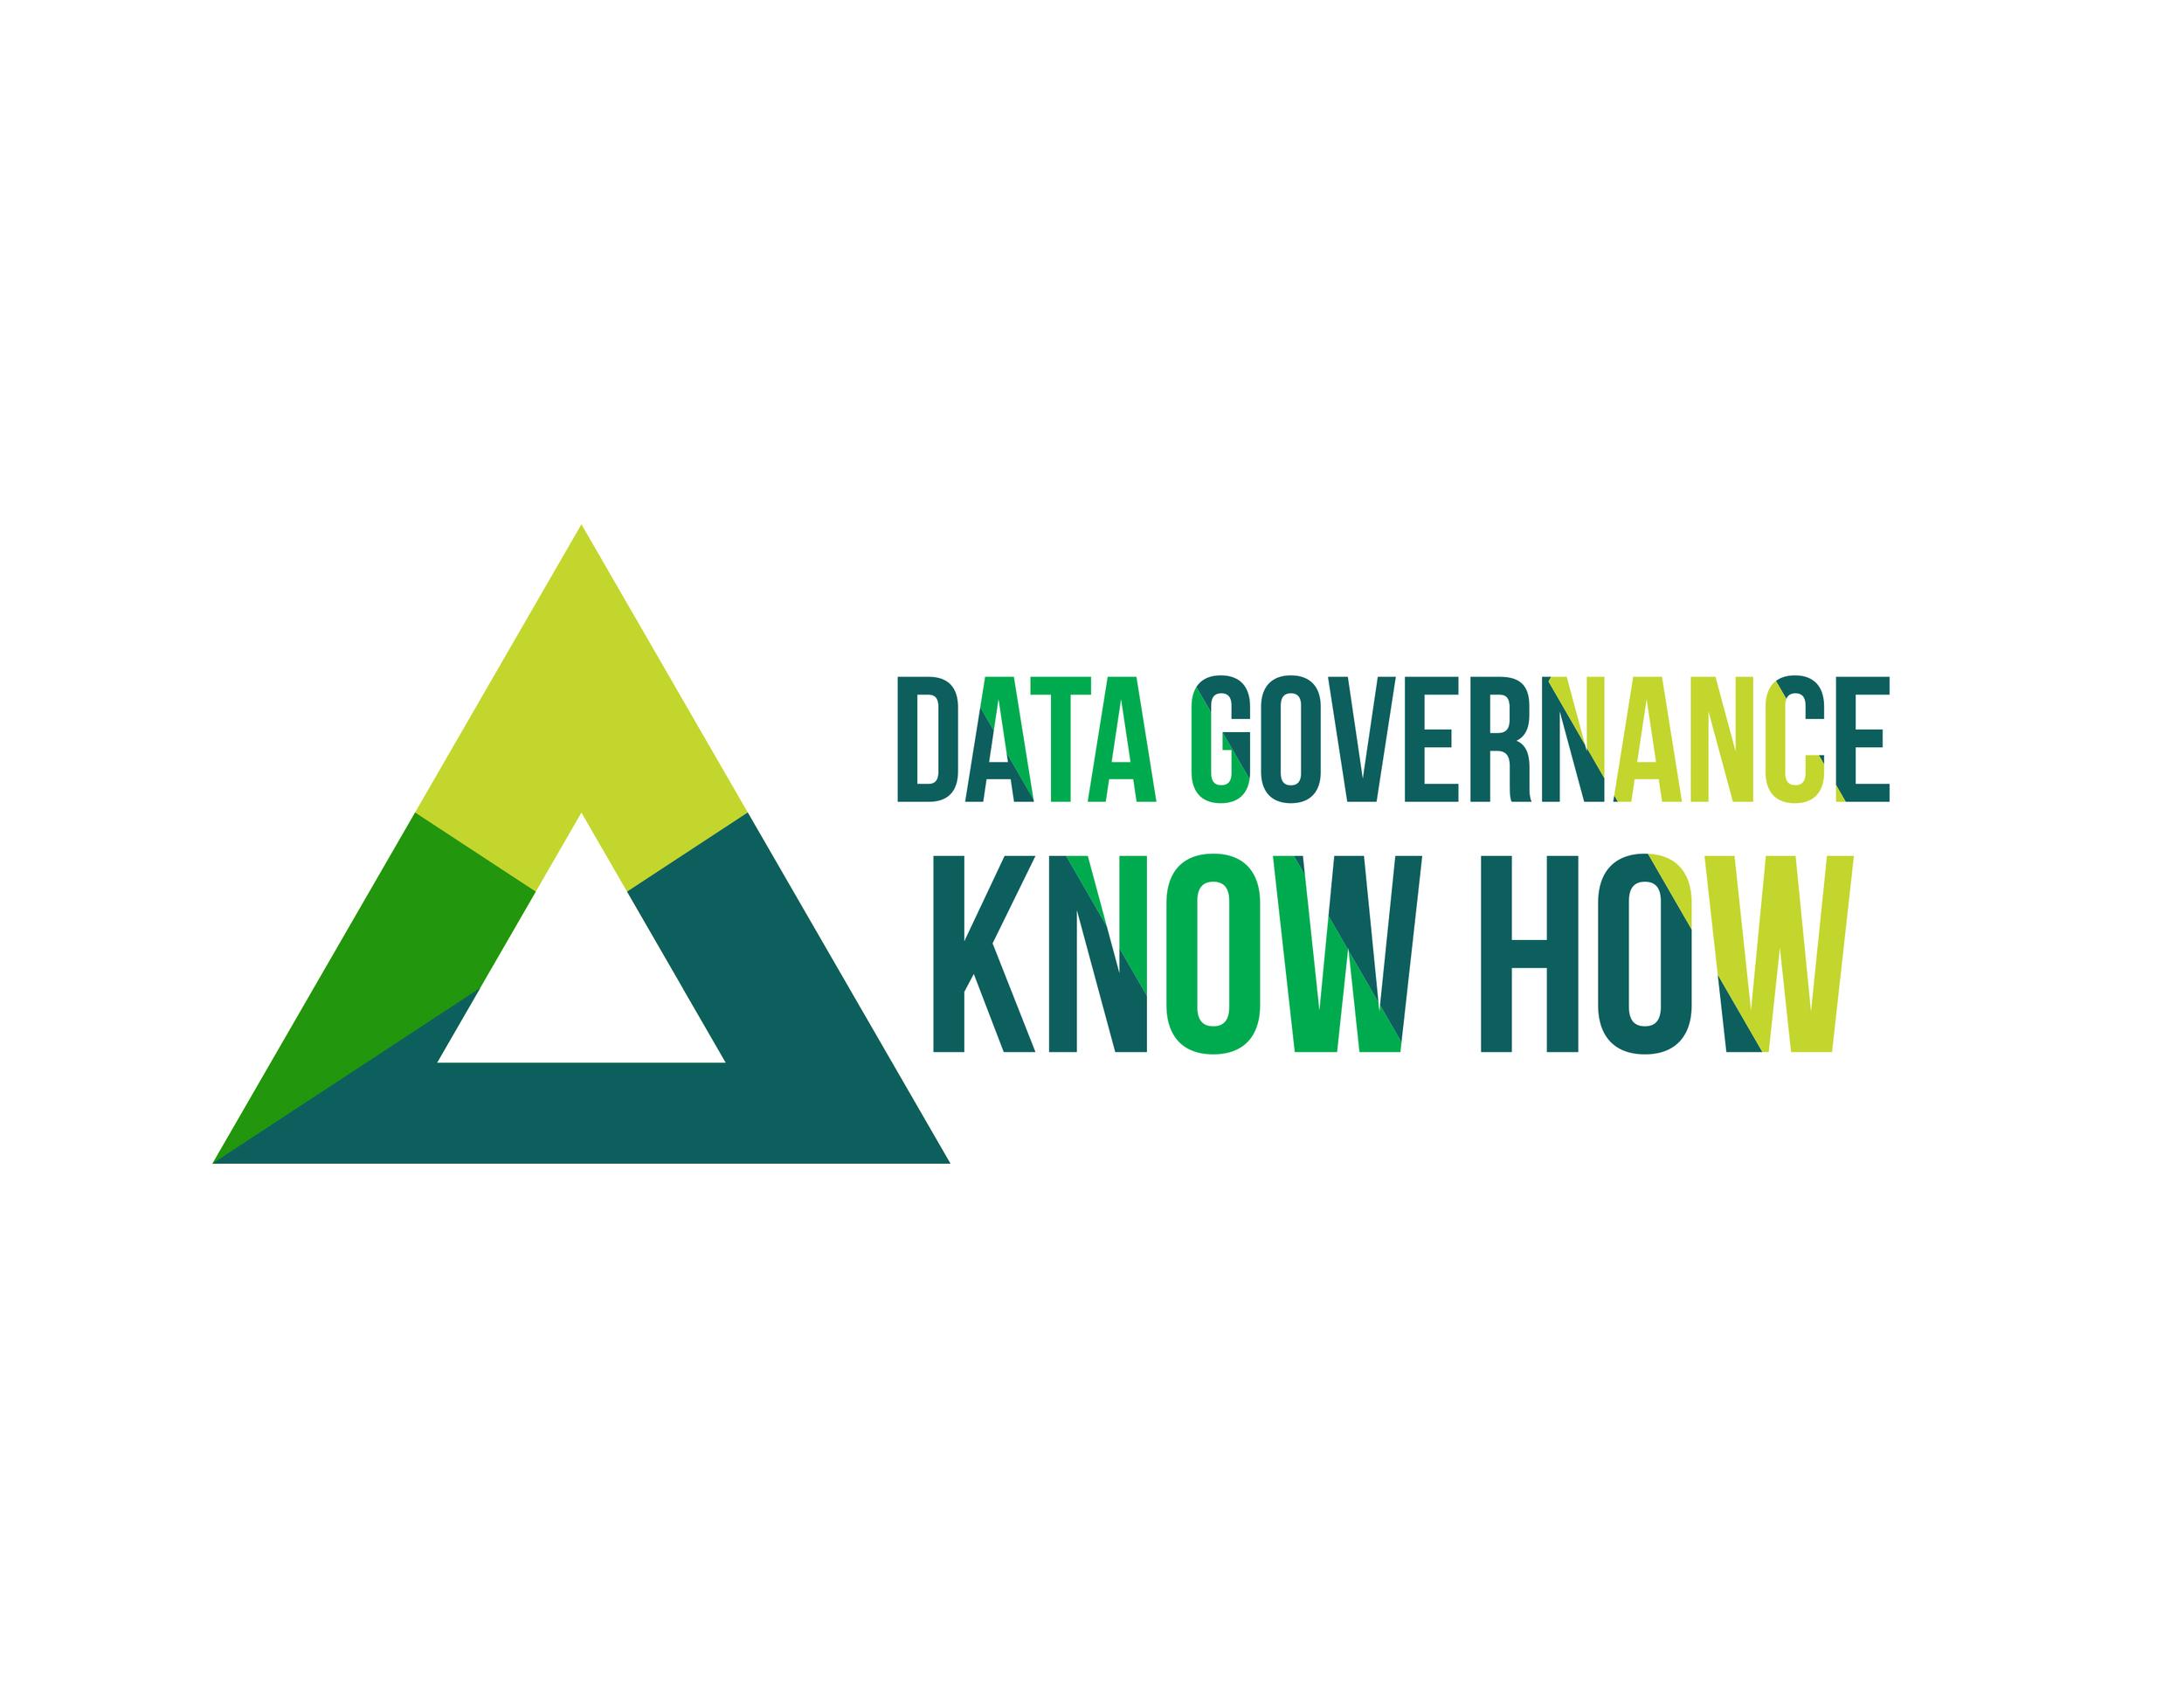 Data Governance Know How LinkedIn Group